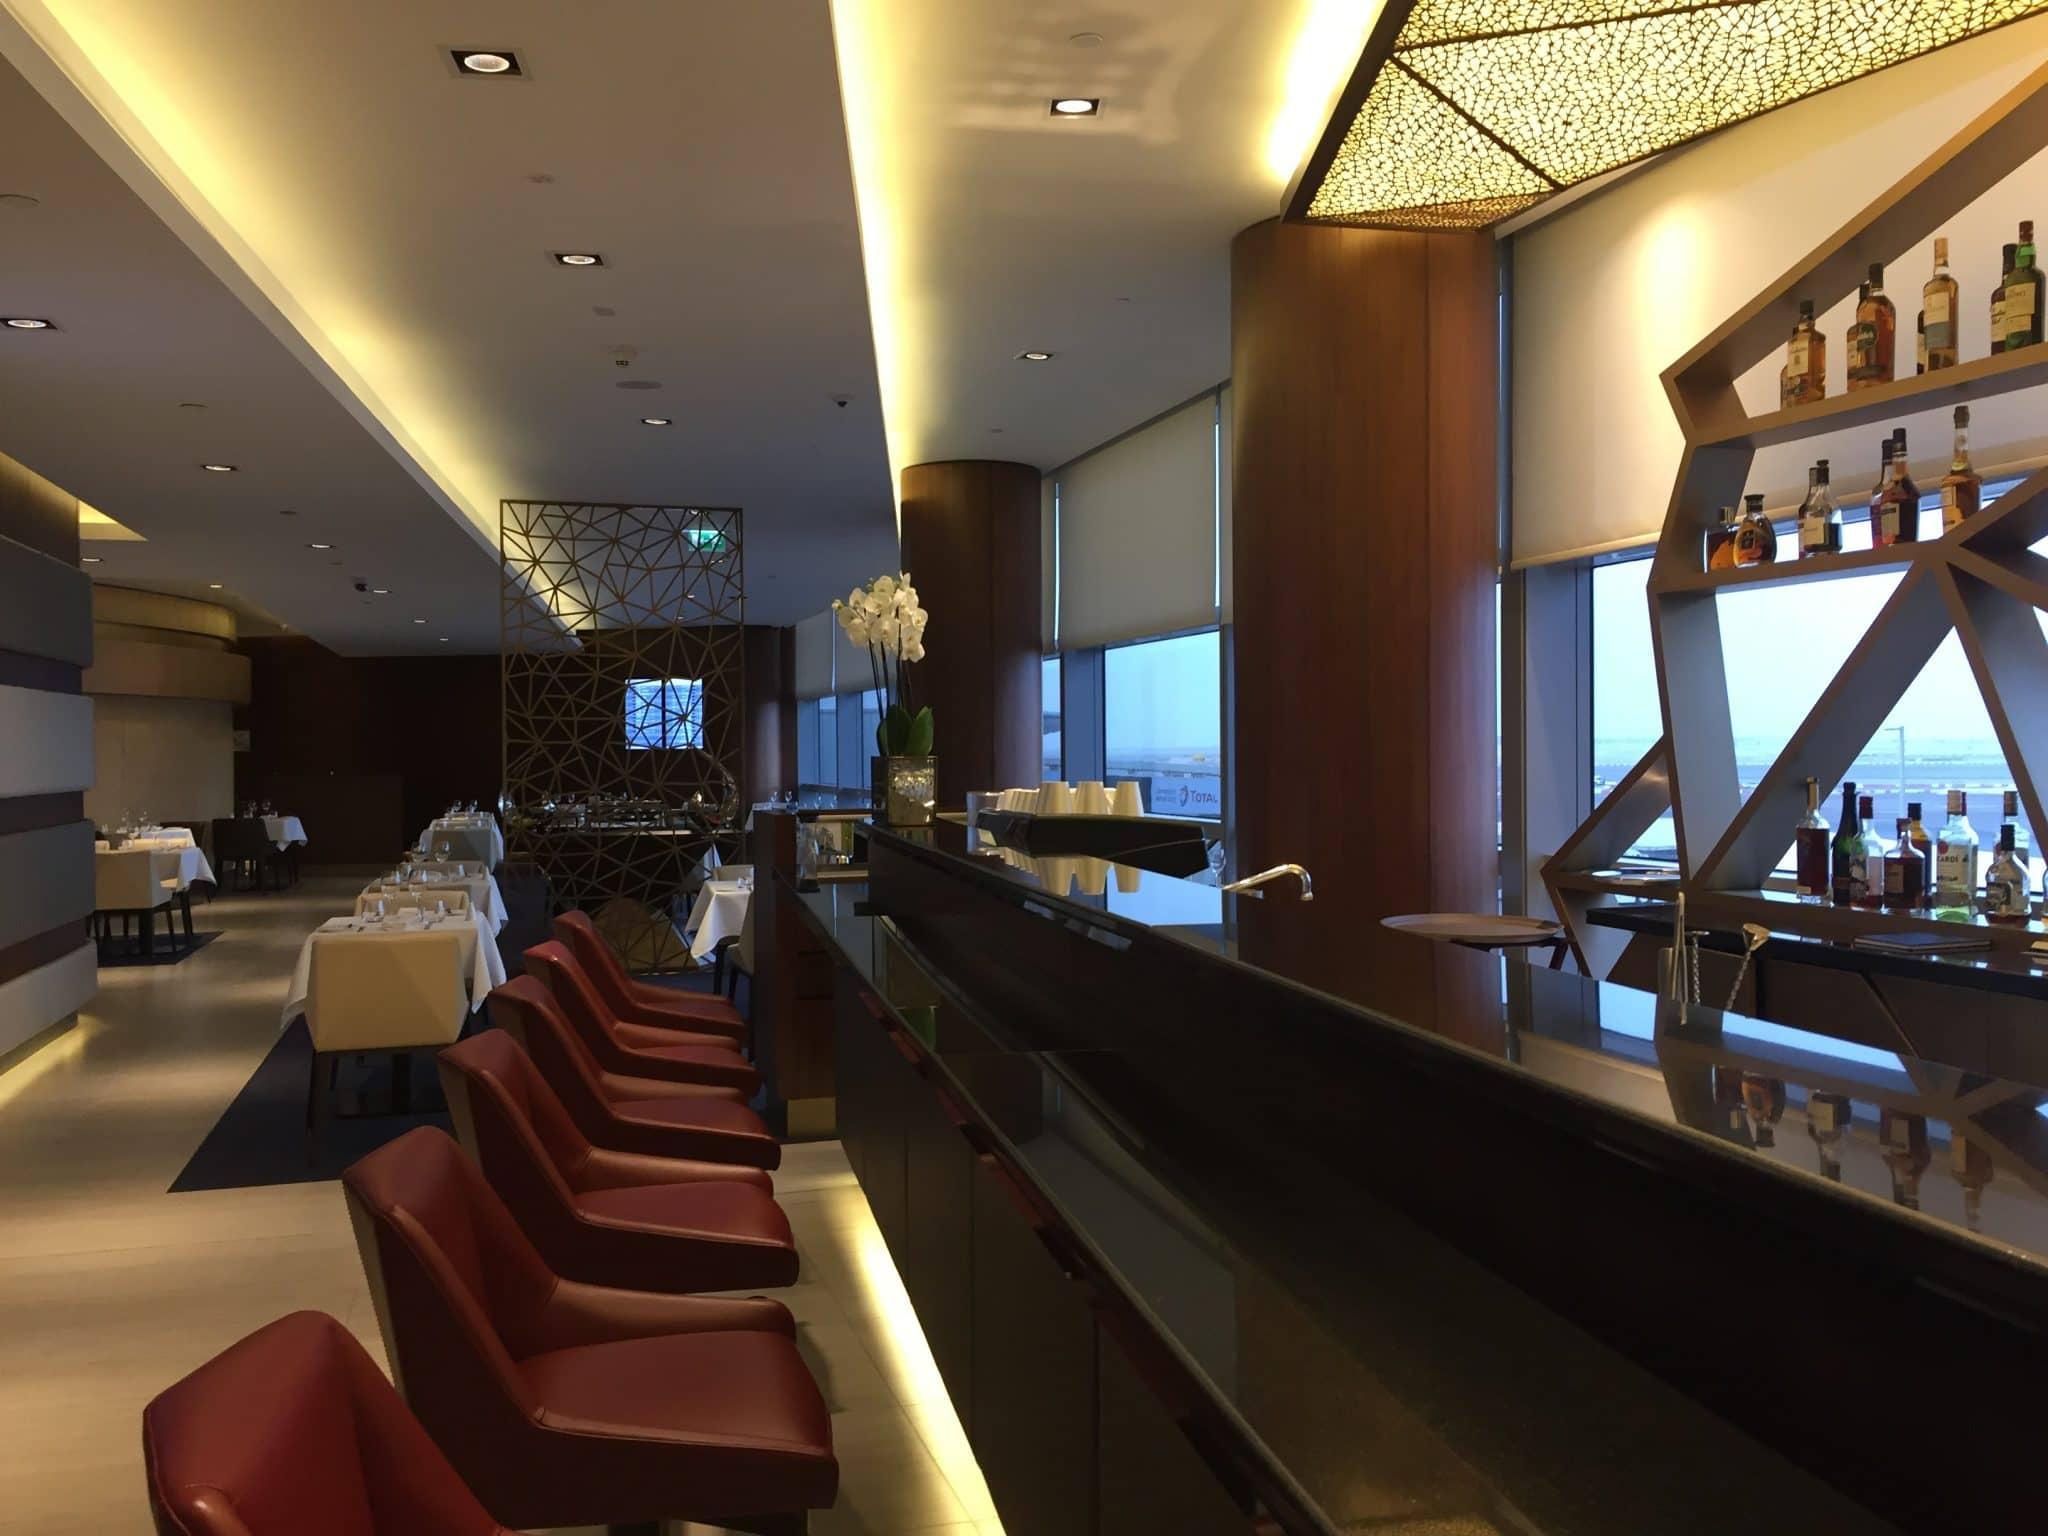 etihad first class lounge abu dhabi bar 3